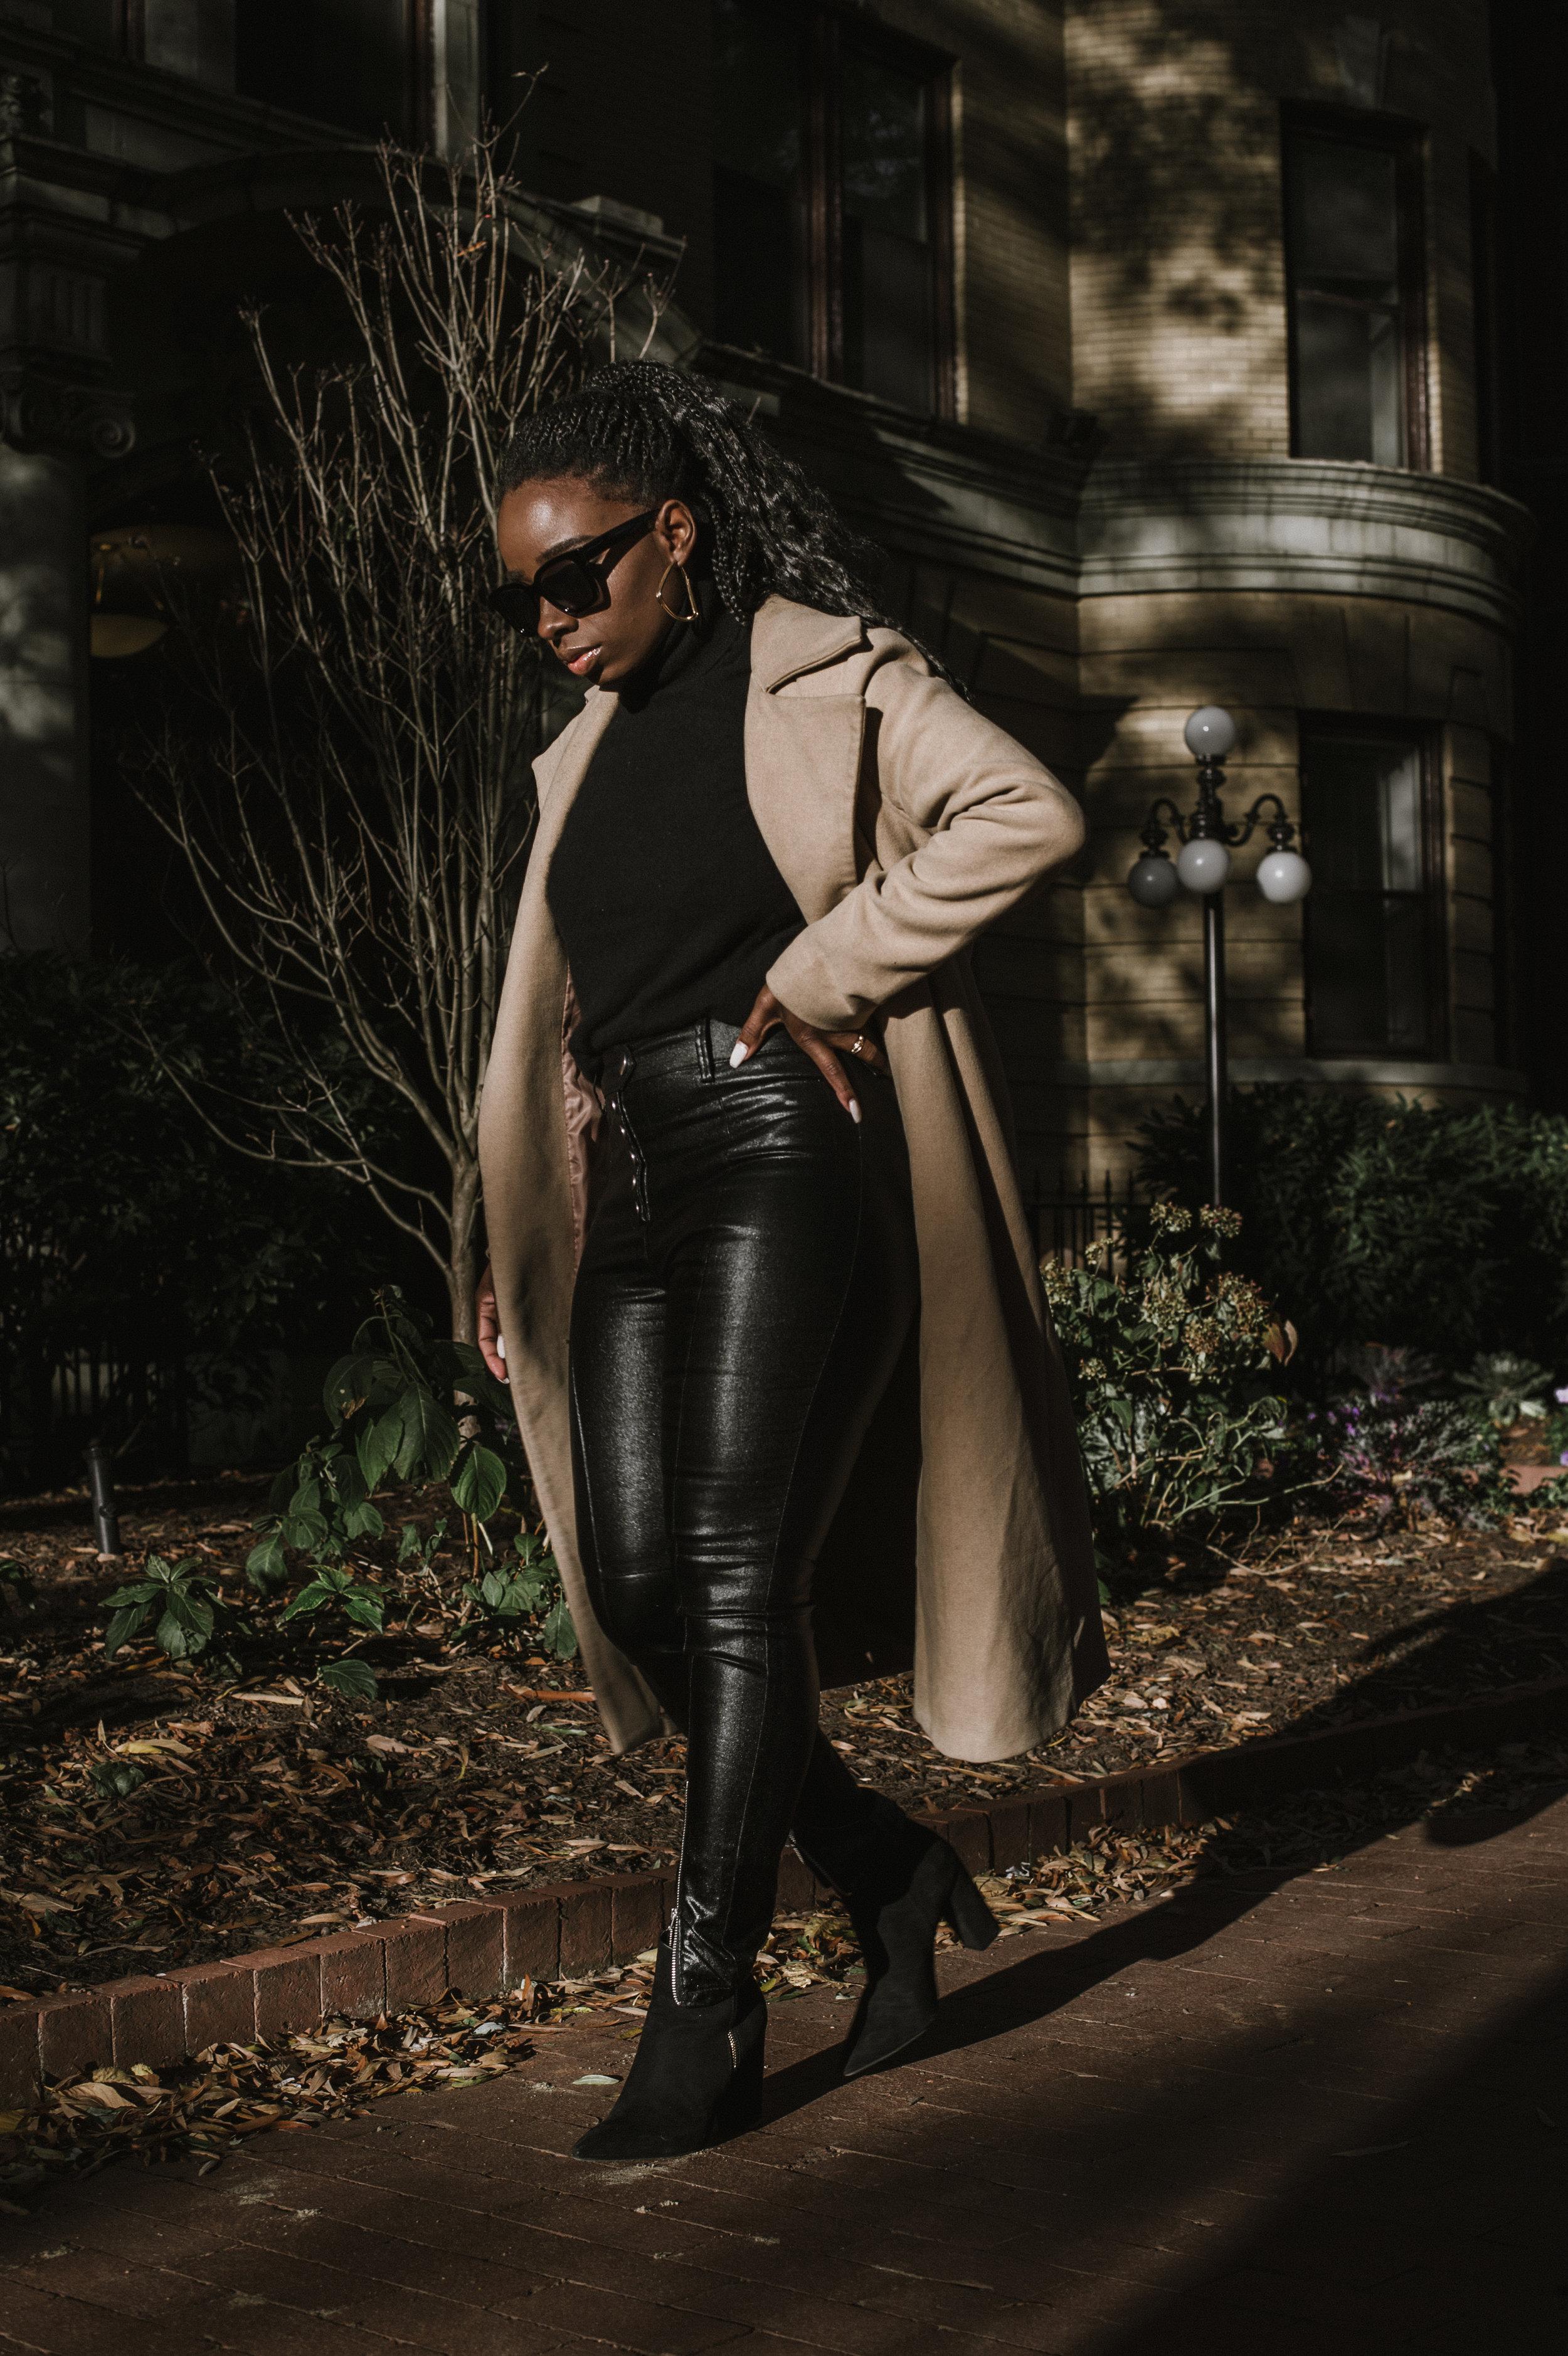 The-Glossier-Tasha-James-Fashion-Style-Blogger-DC-Winter-Coat-All-Black-34.jpg